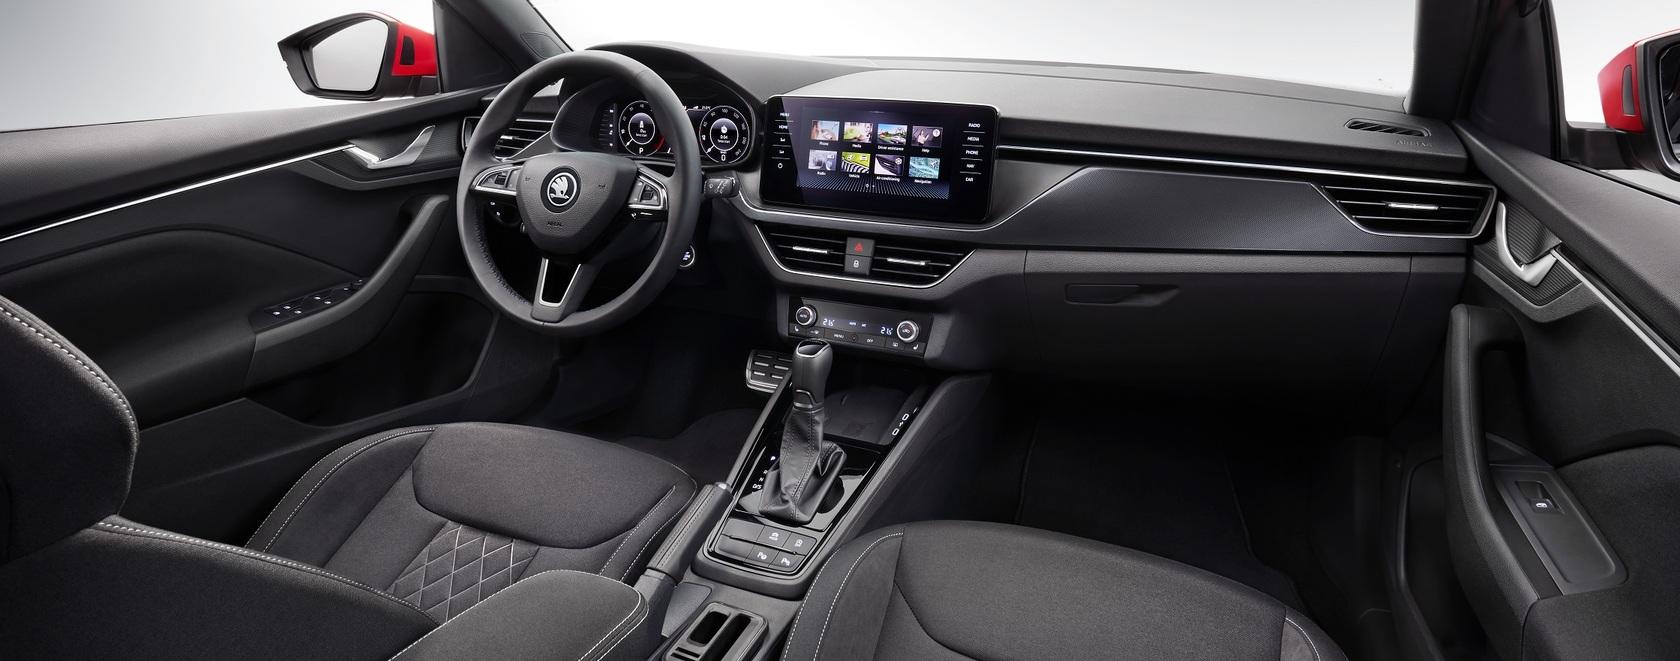 kamiq-interior-introduction.64bc211f9c9a